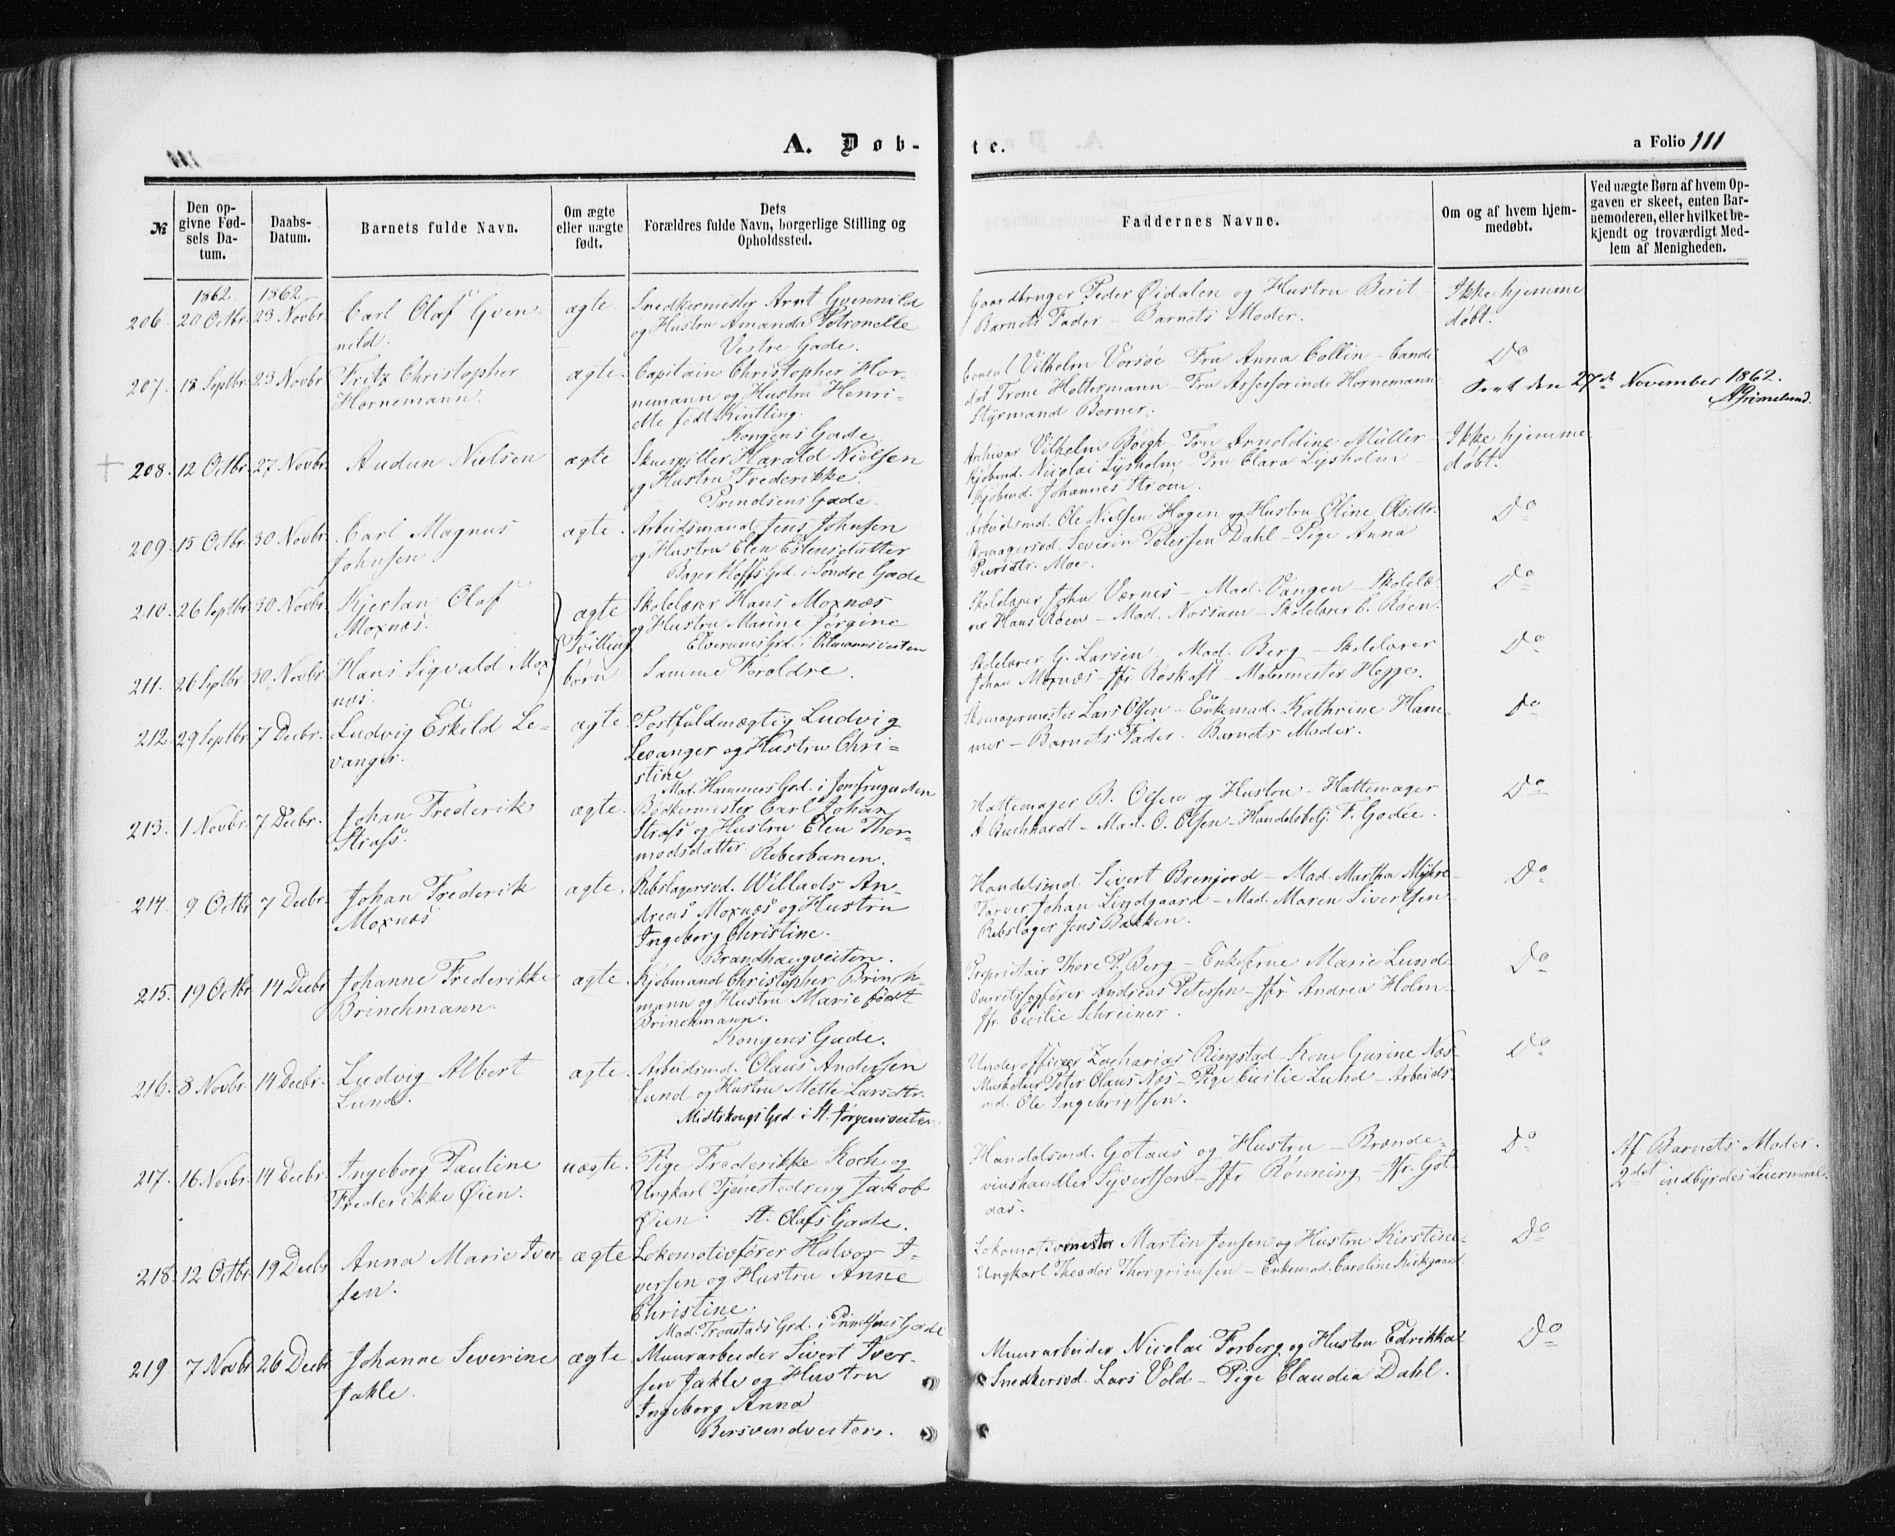 SAT, Ministerialprotokoller, klokkerbøker og fødselsregistre - Sør-Trøndelag, 601/L0053: Parish register (official) no. 601A21, 1857-1865, p. 111